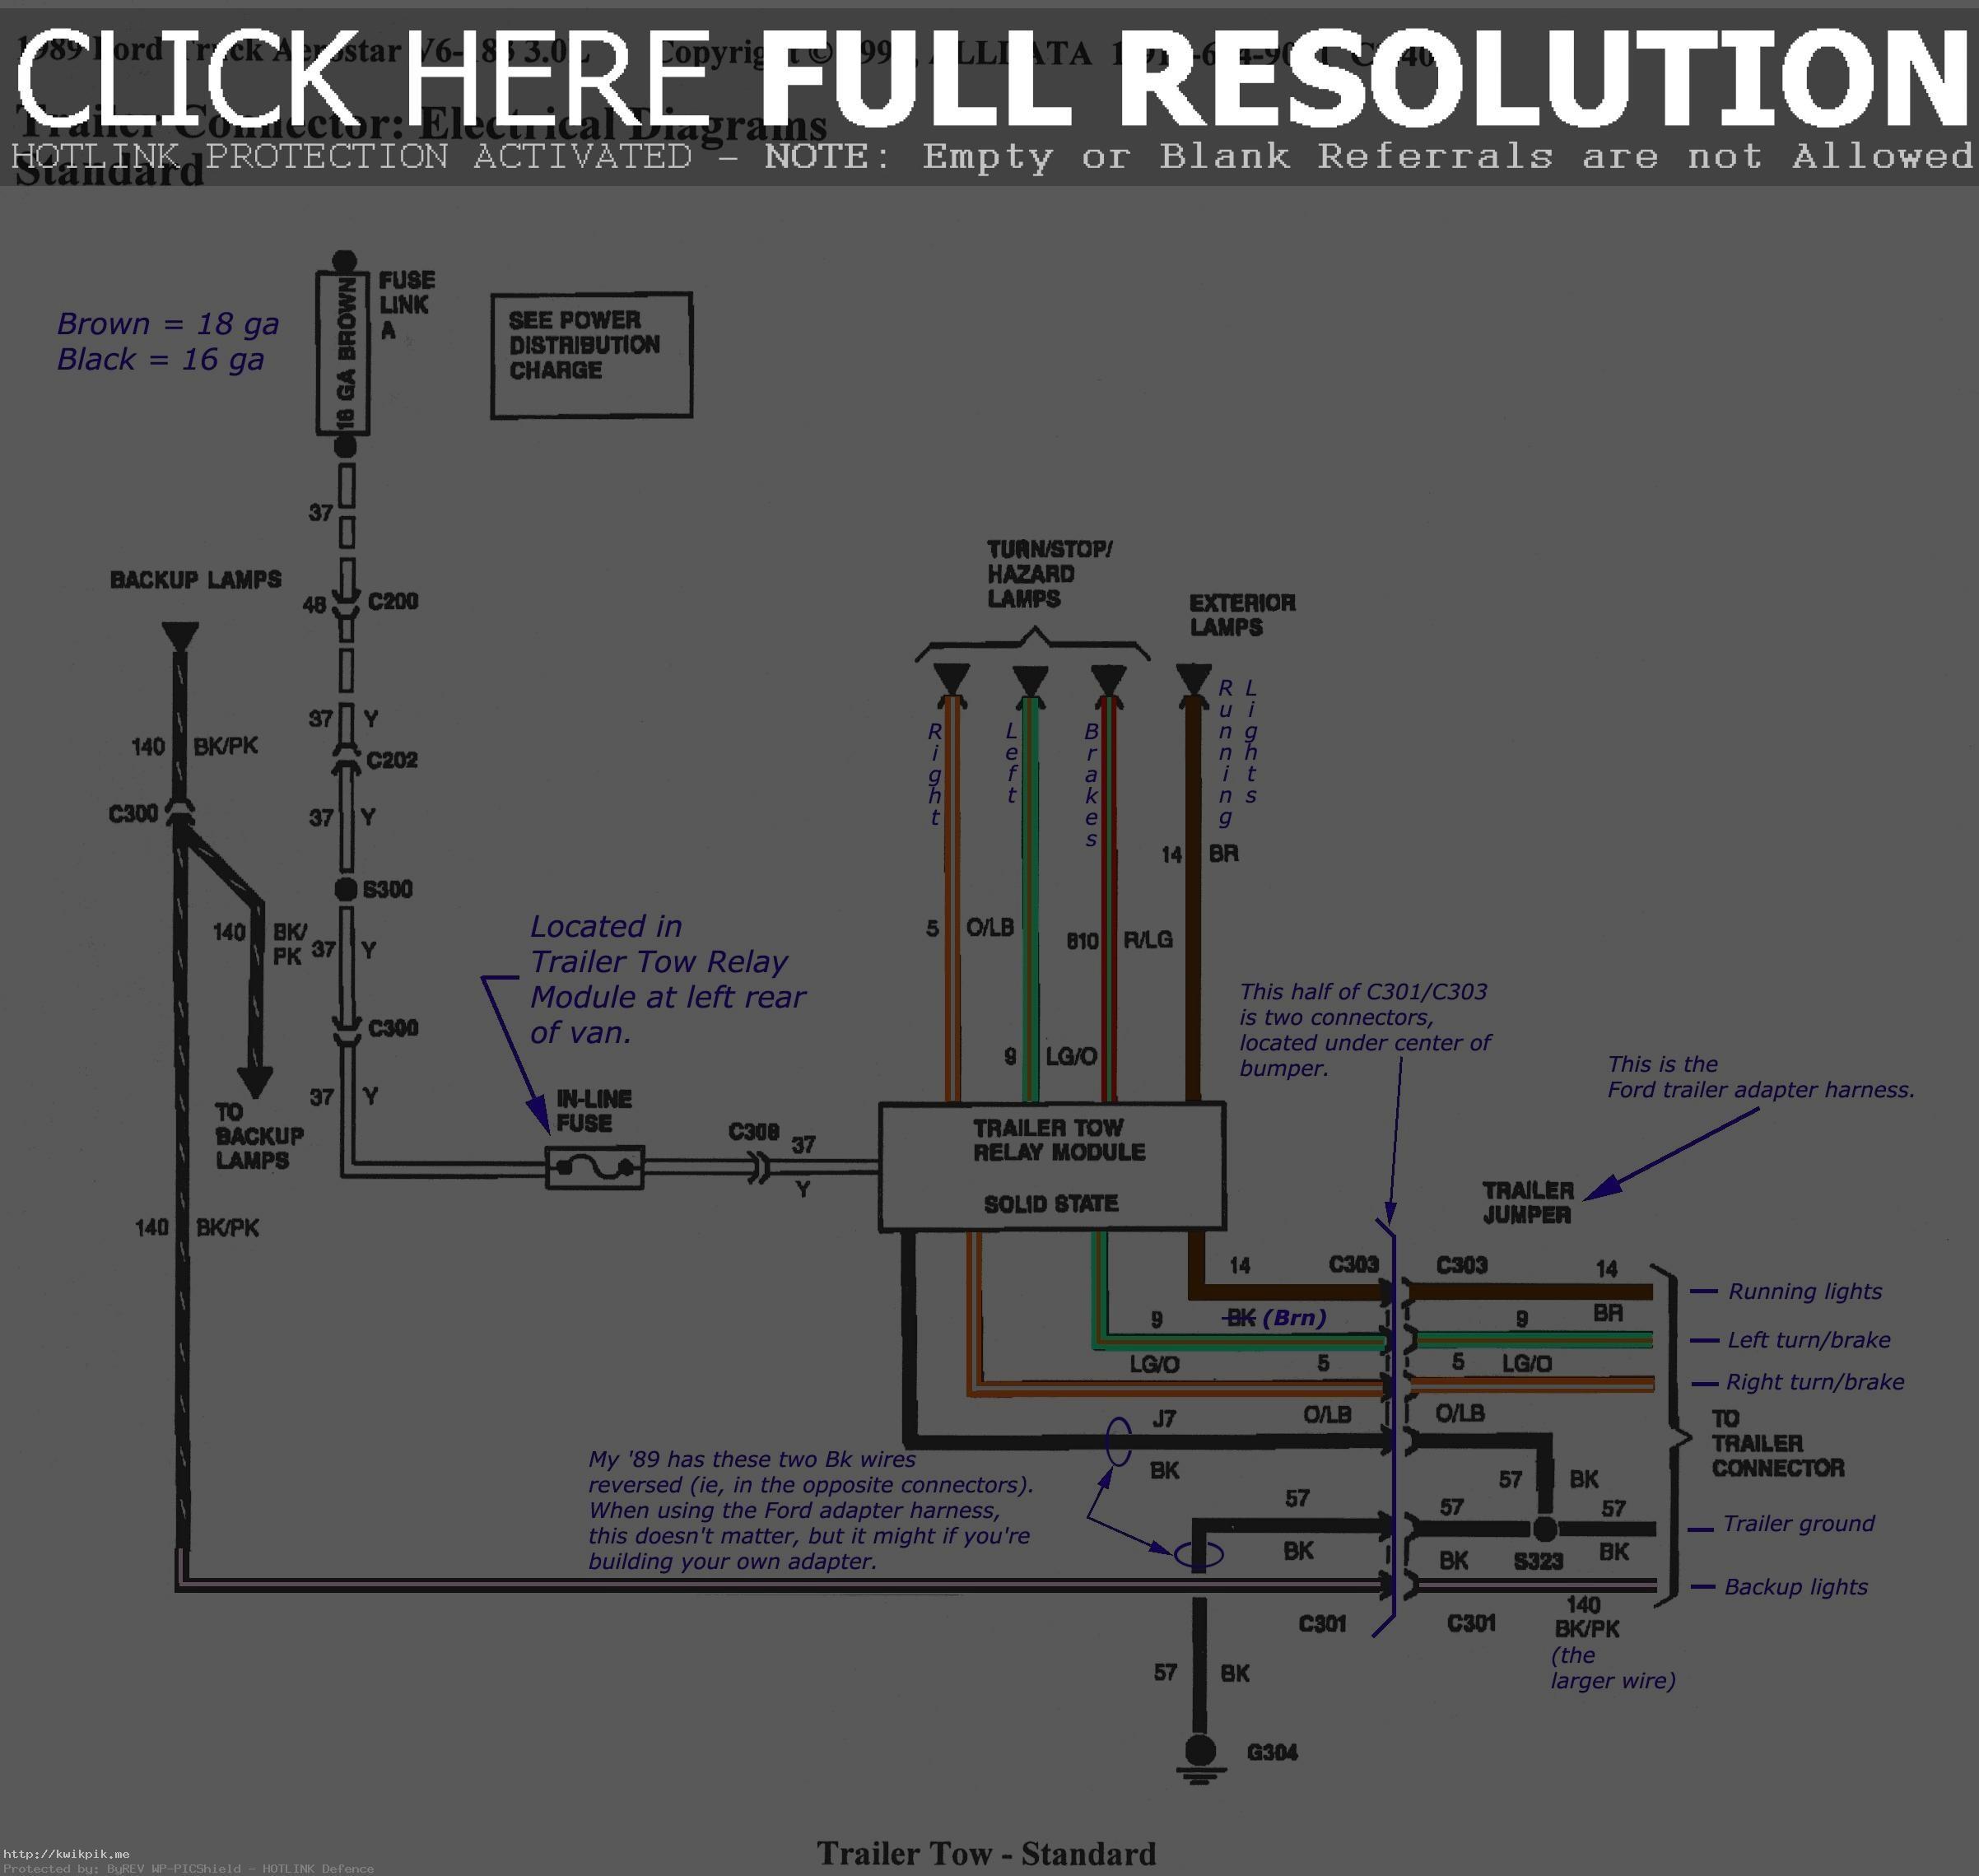 2013 Tundra Mirror Wiring Diagram | Wiring Diagram - Ford F150 Backup Camera Wiring Diagram